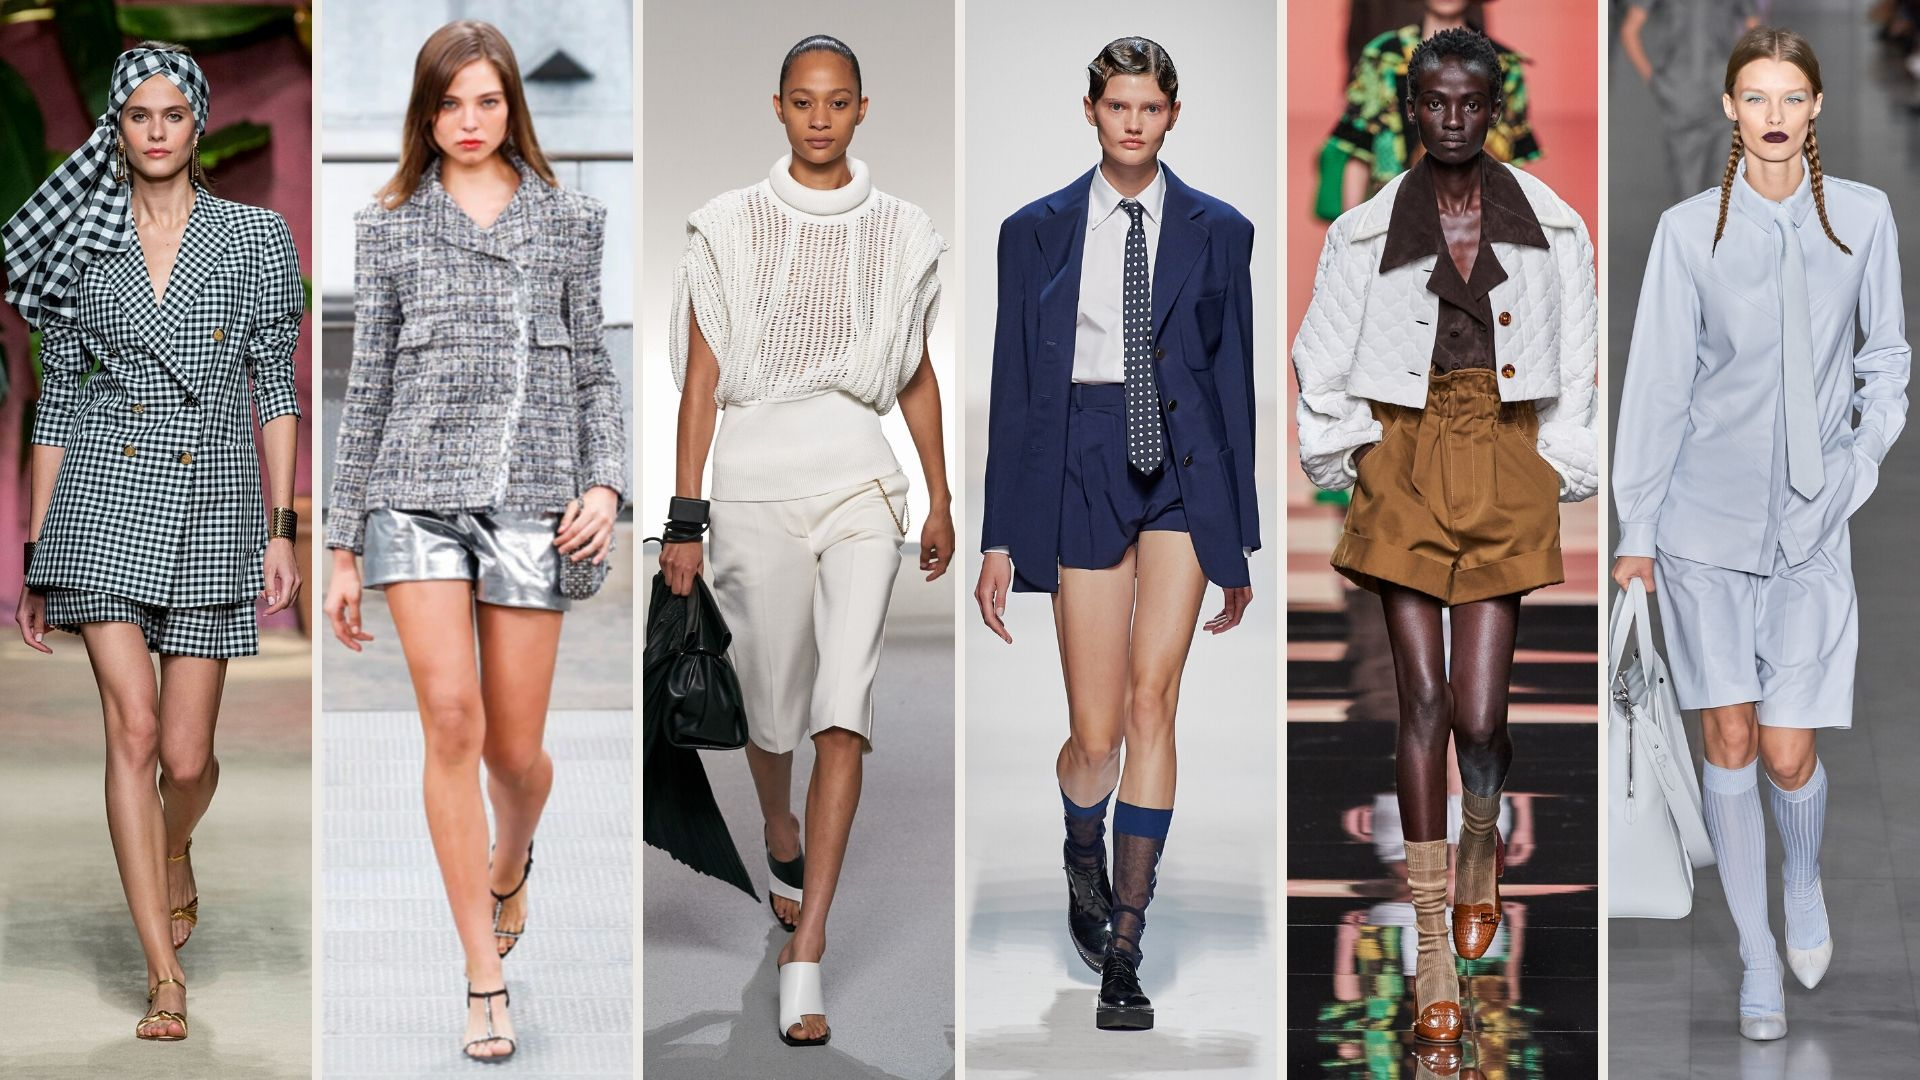 addio shorts, ecco la tendenza bermuda